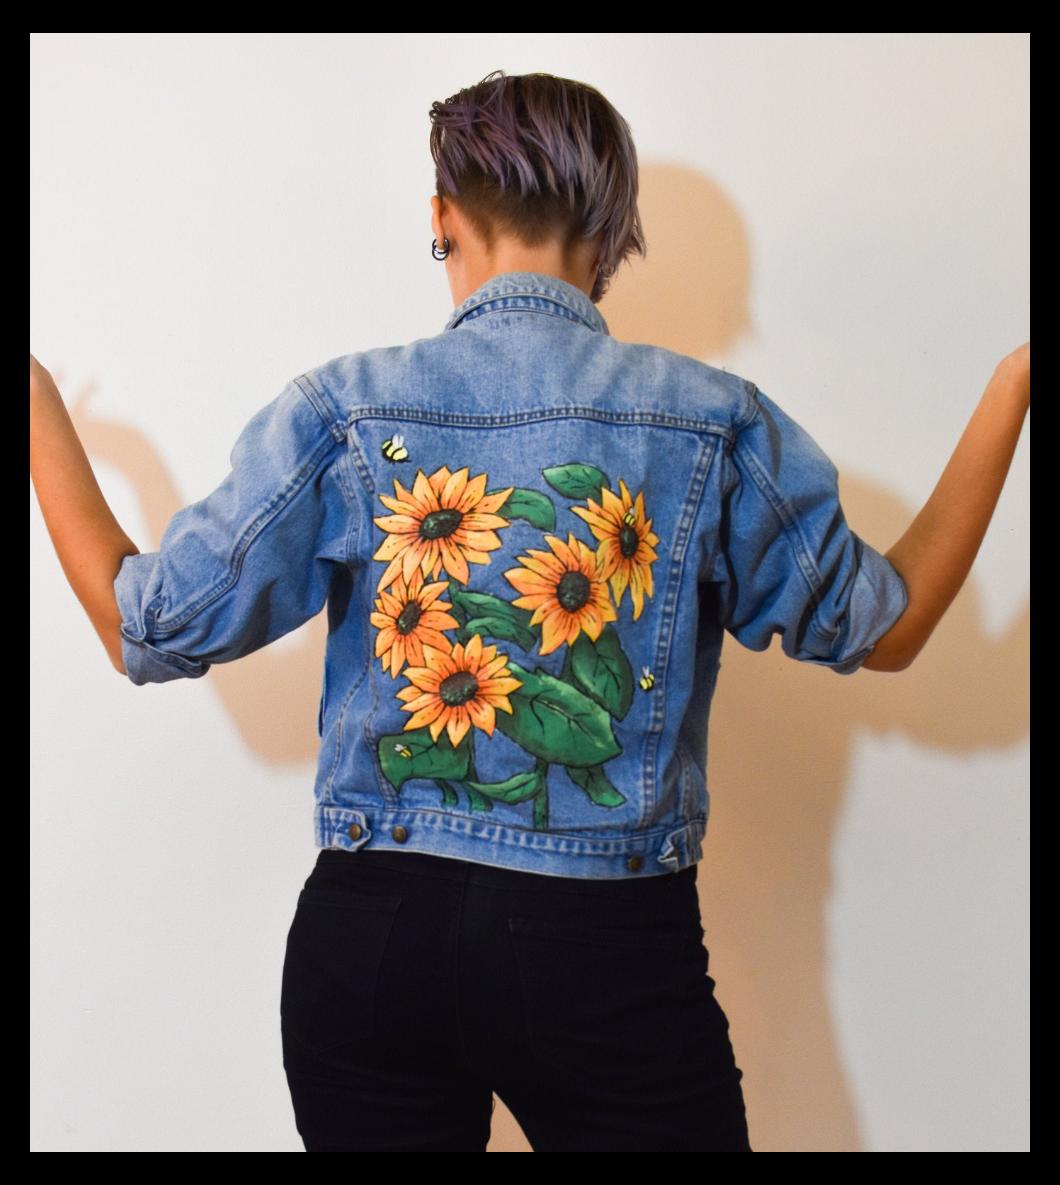 Jean Jacket Handpainted Floral Jacket Art Sunflowers Jacket Sunflower Jean Jacket Sunflowers Art Painted Jacket Hand Painted Jacket